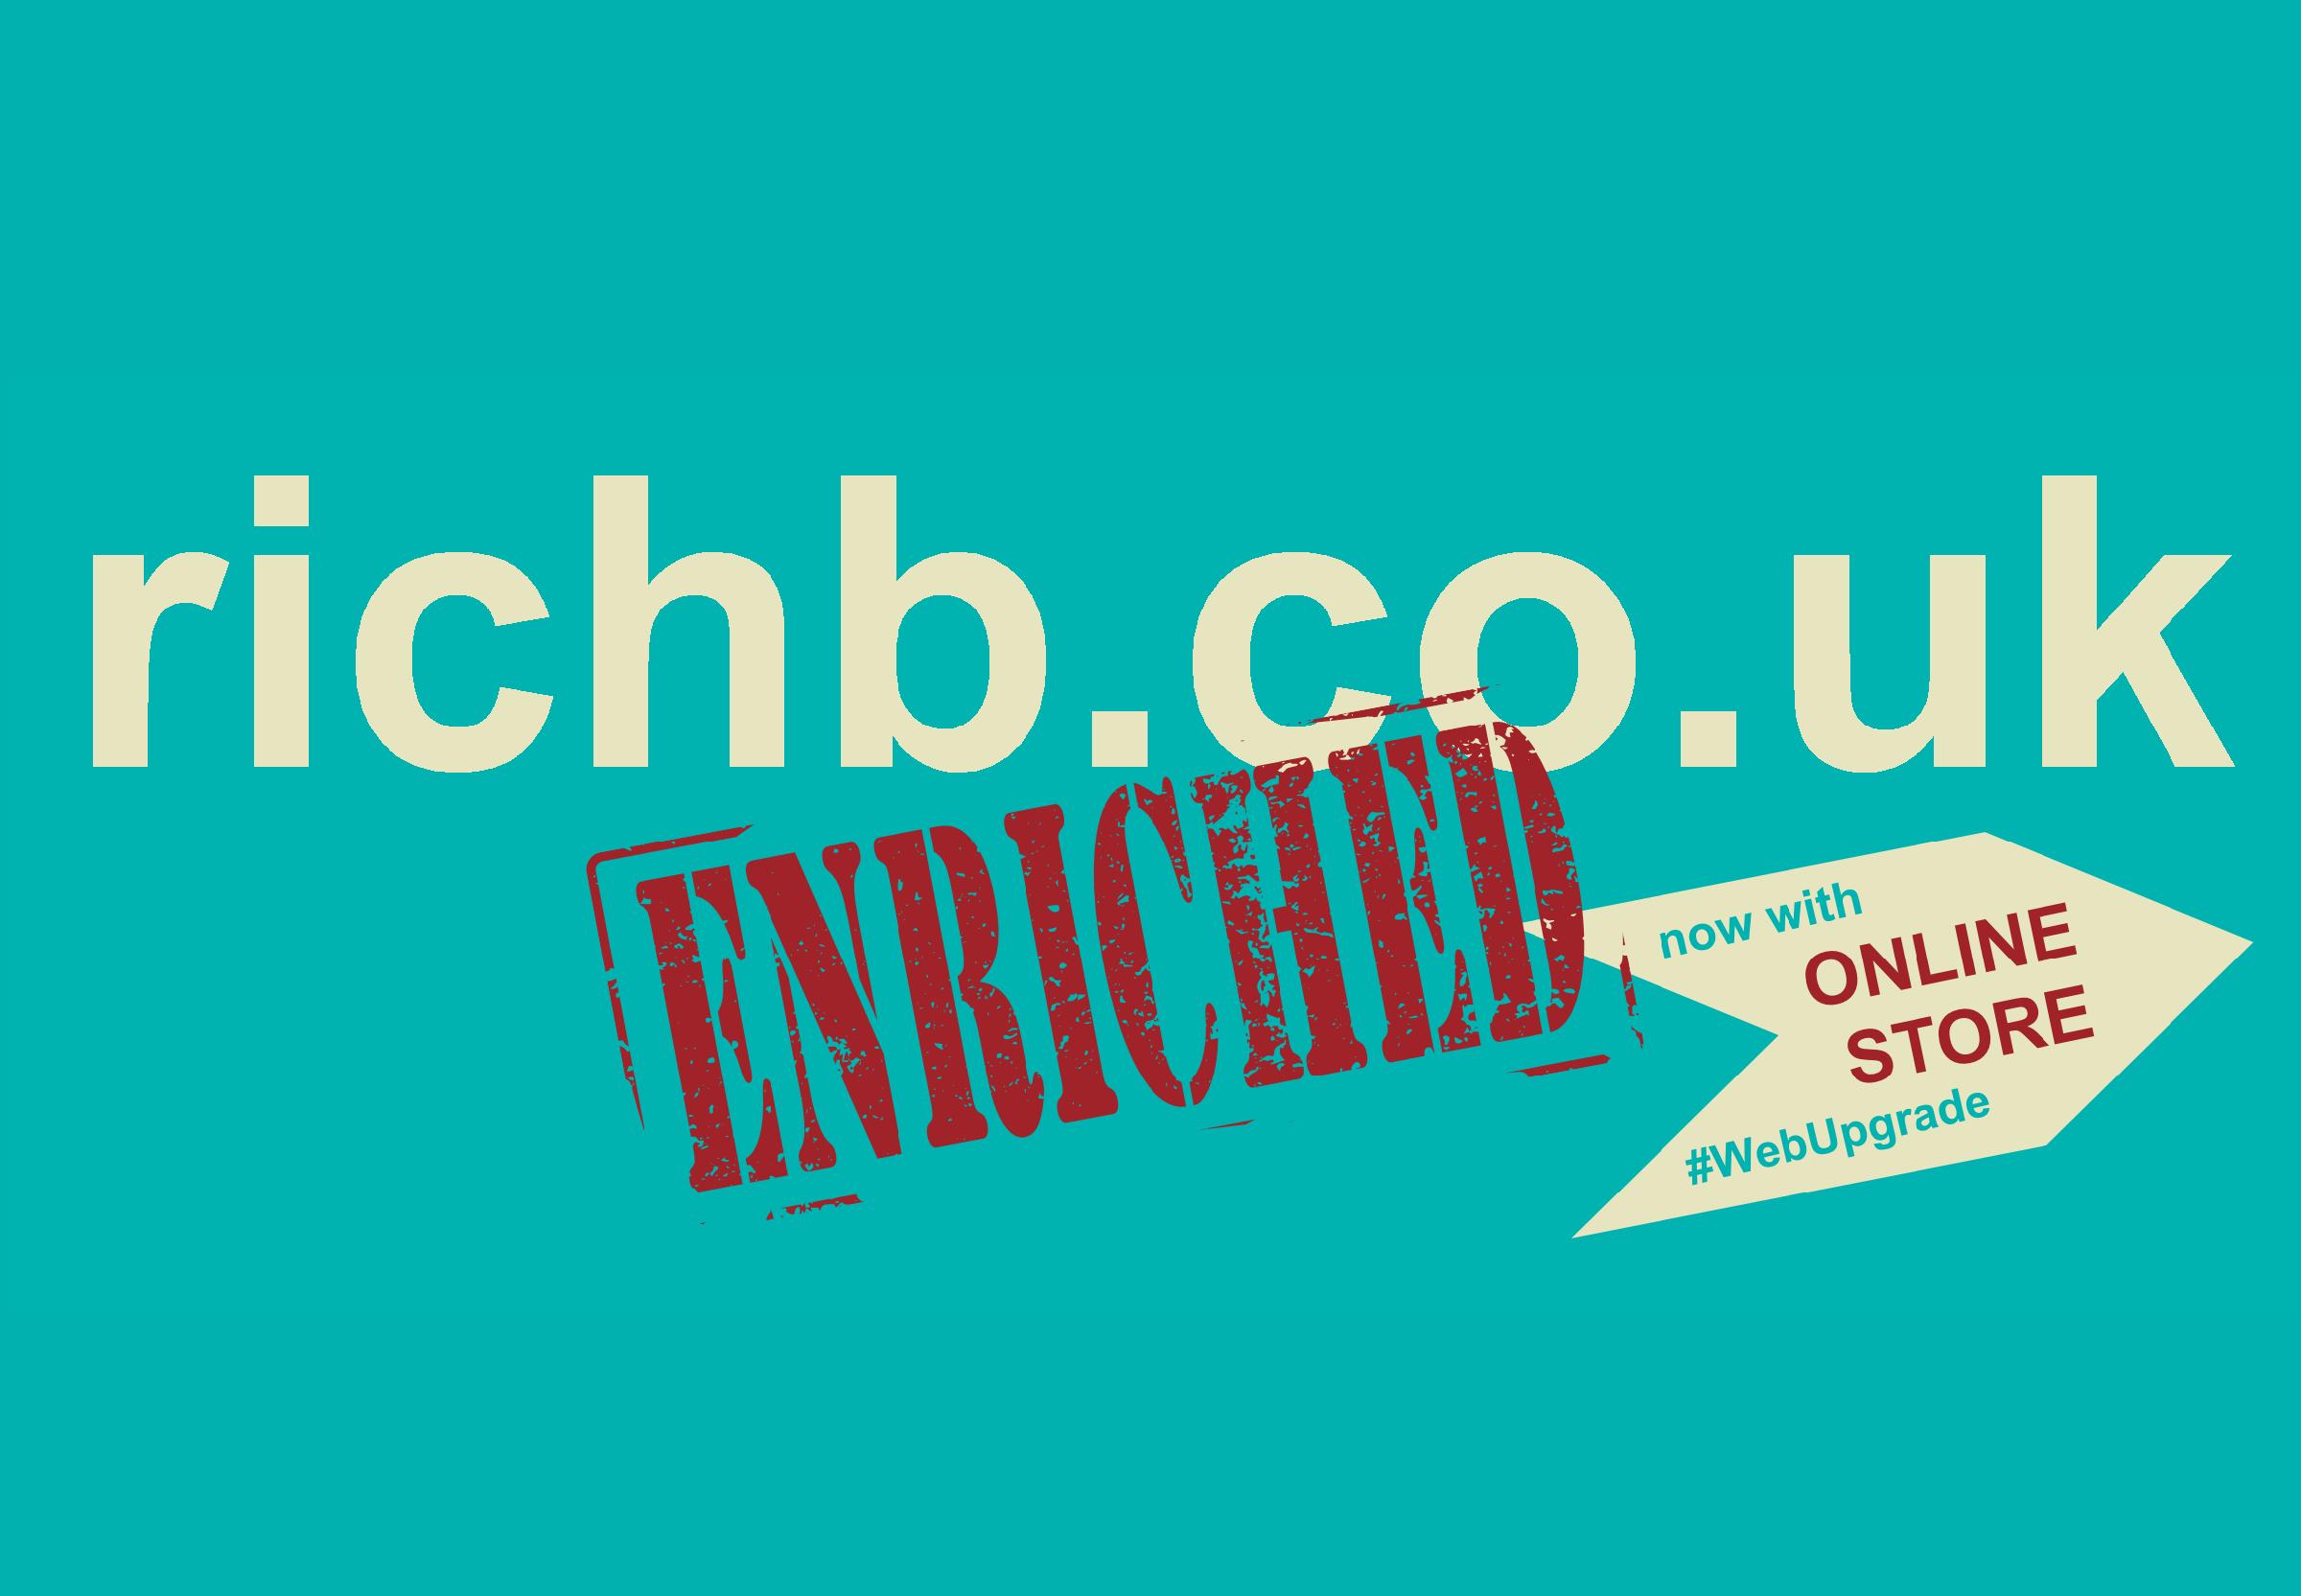 new website banner advert square